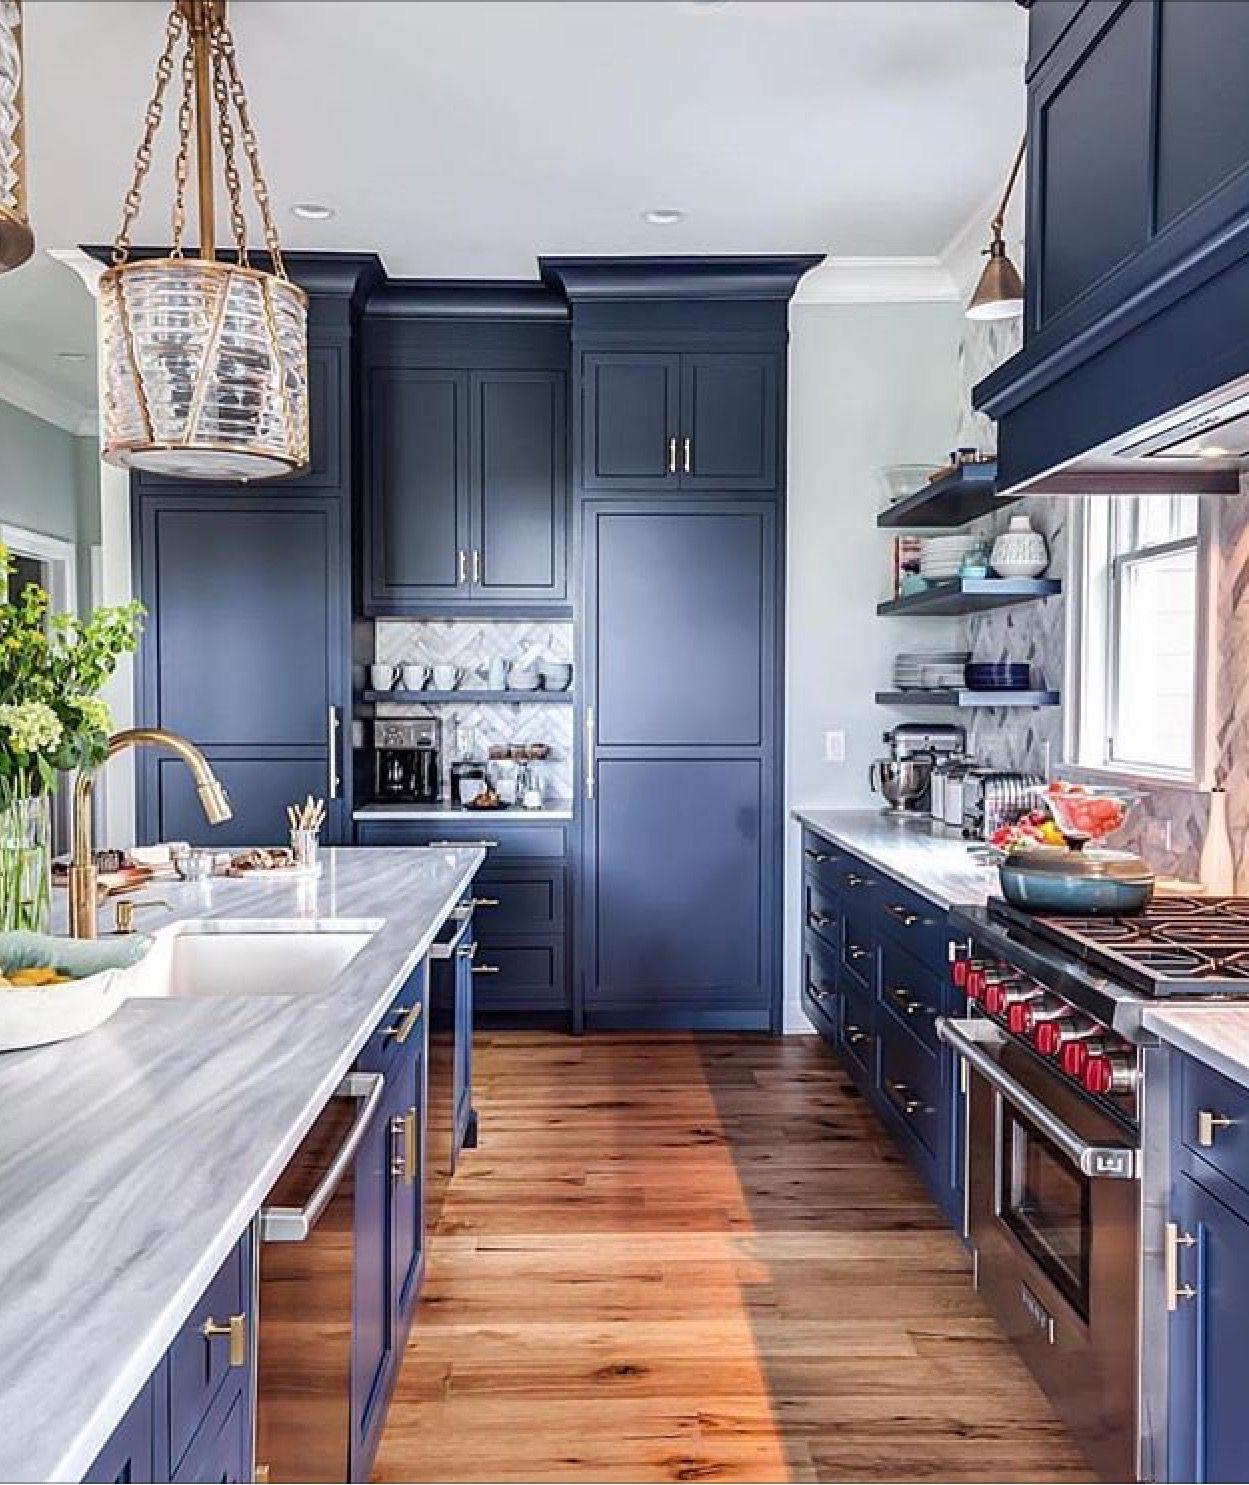 Herringbone Pattern Marble Backsplash With Images Projekty Wnetrz Kuchni Luksusowe Kuchnie Projekty Kuchni